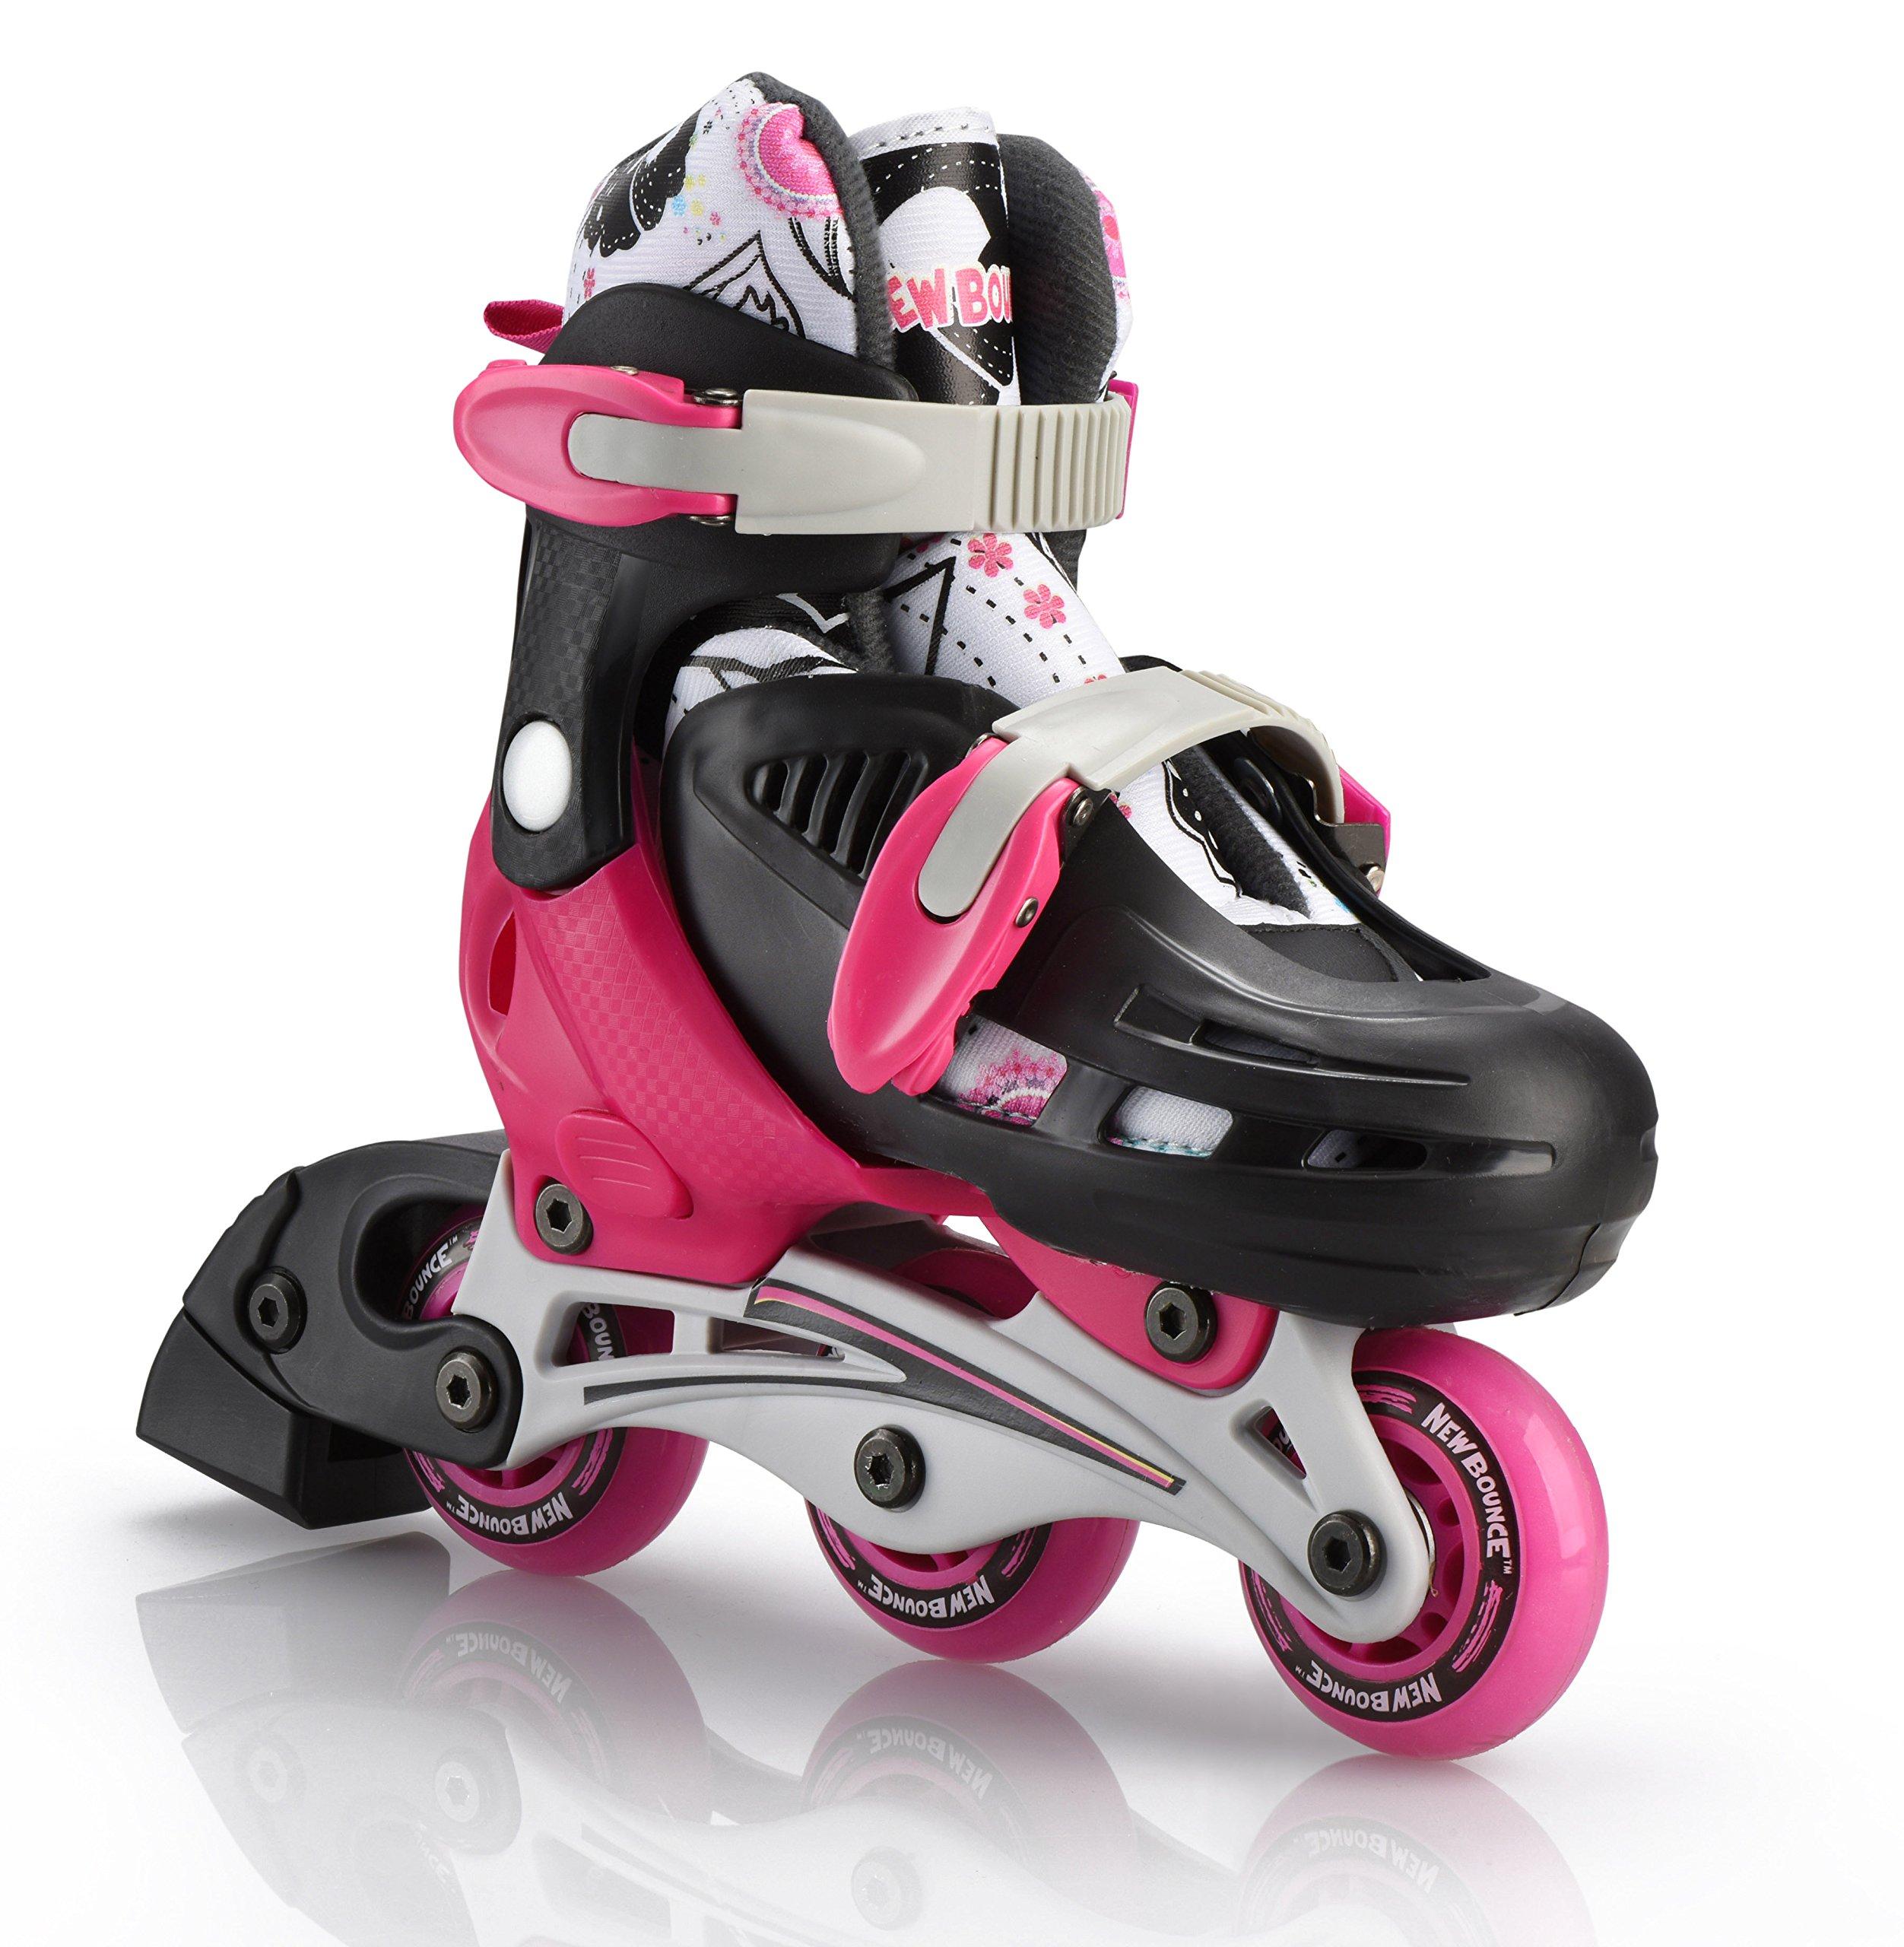 New Bounce Premium 2 in 1 Convertible Roller Skate Junior size 8-11, Tri wheel skate or inline Skates